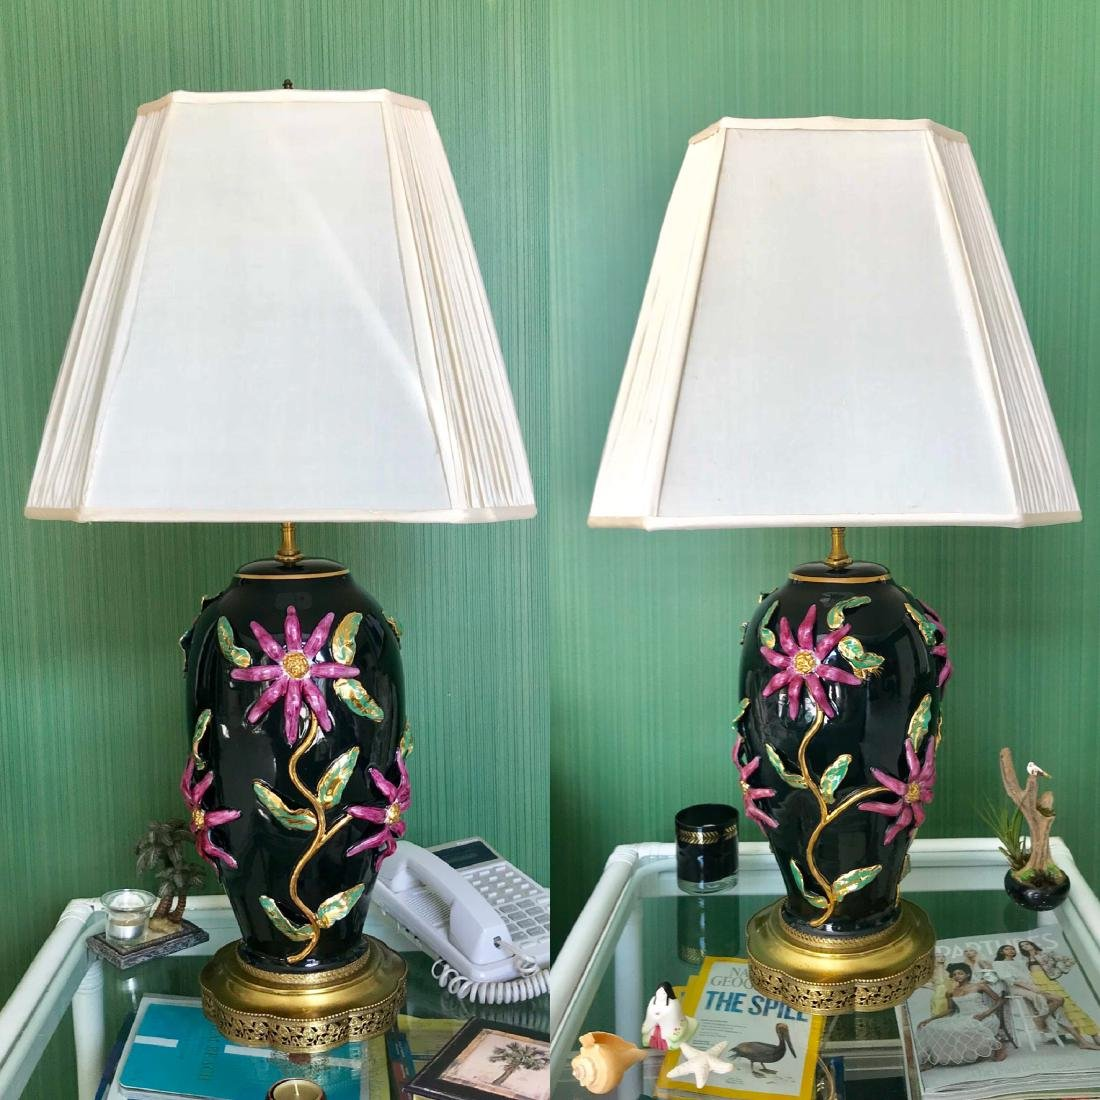 Pair of Capodimonte Porcelain Vases -Black background